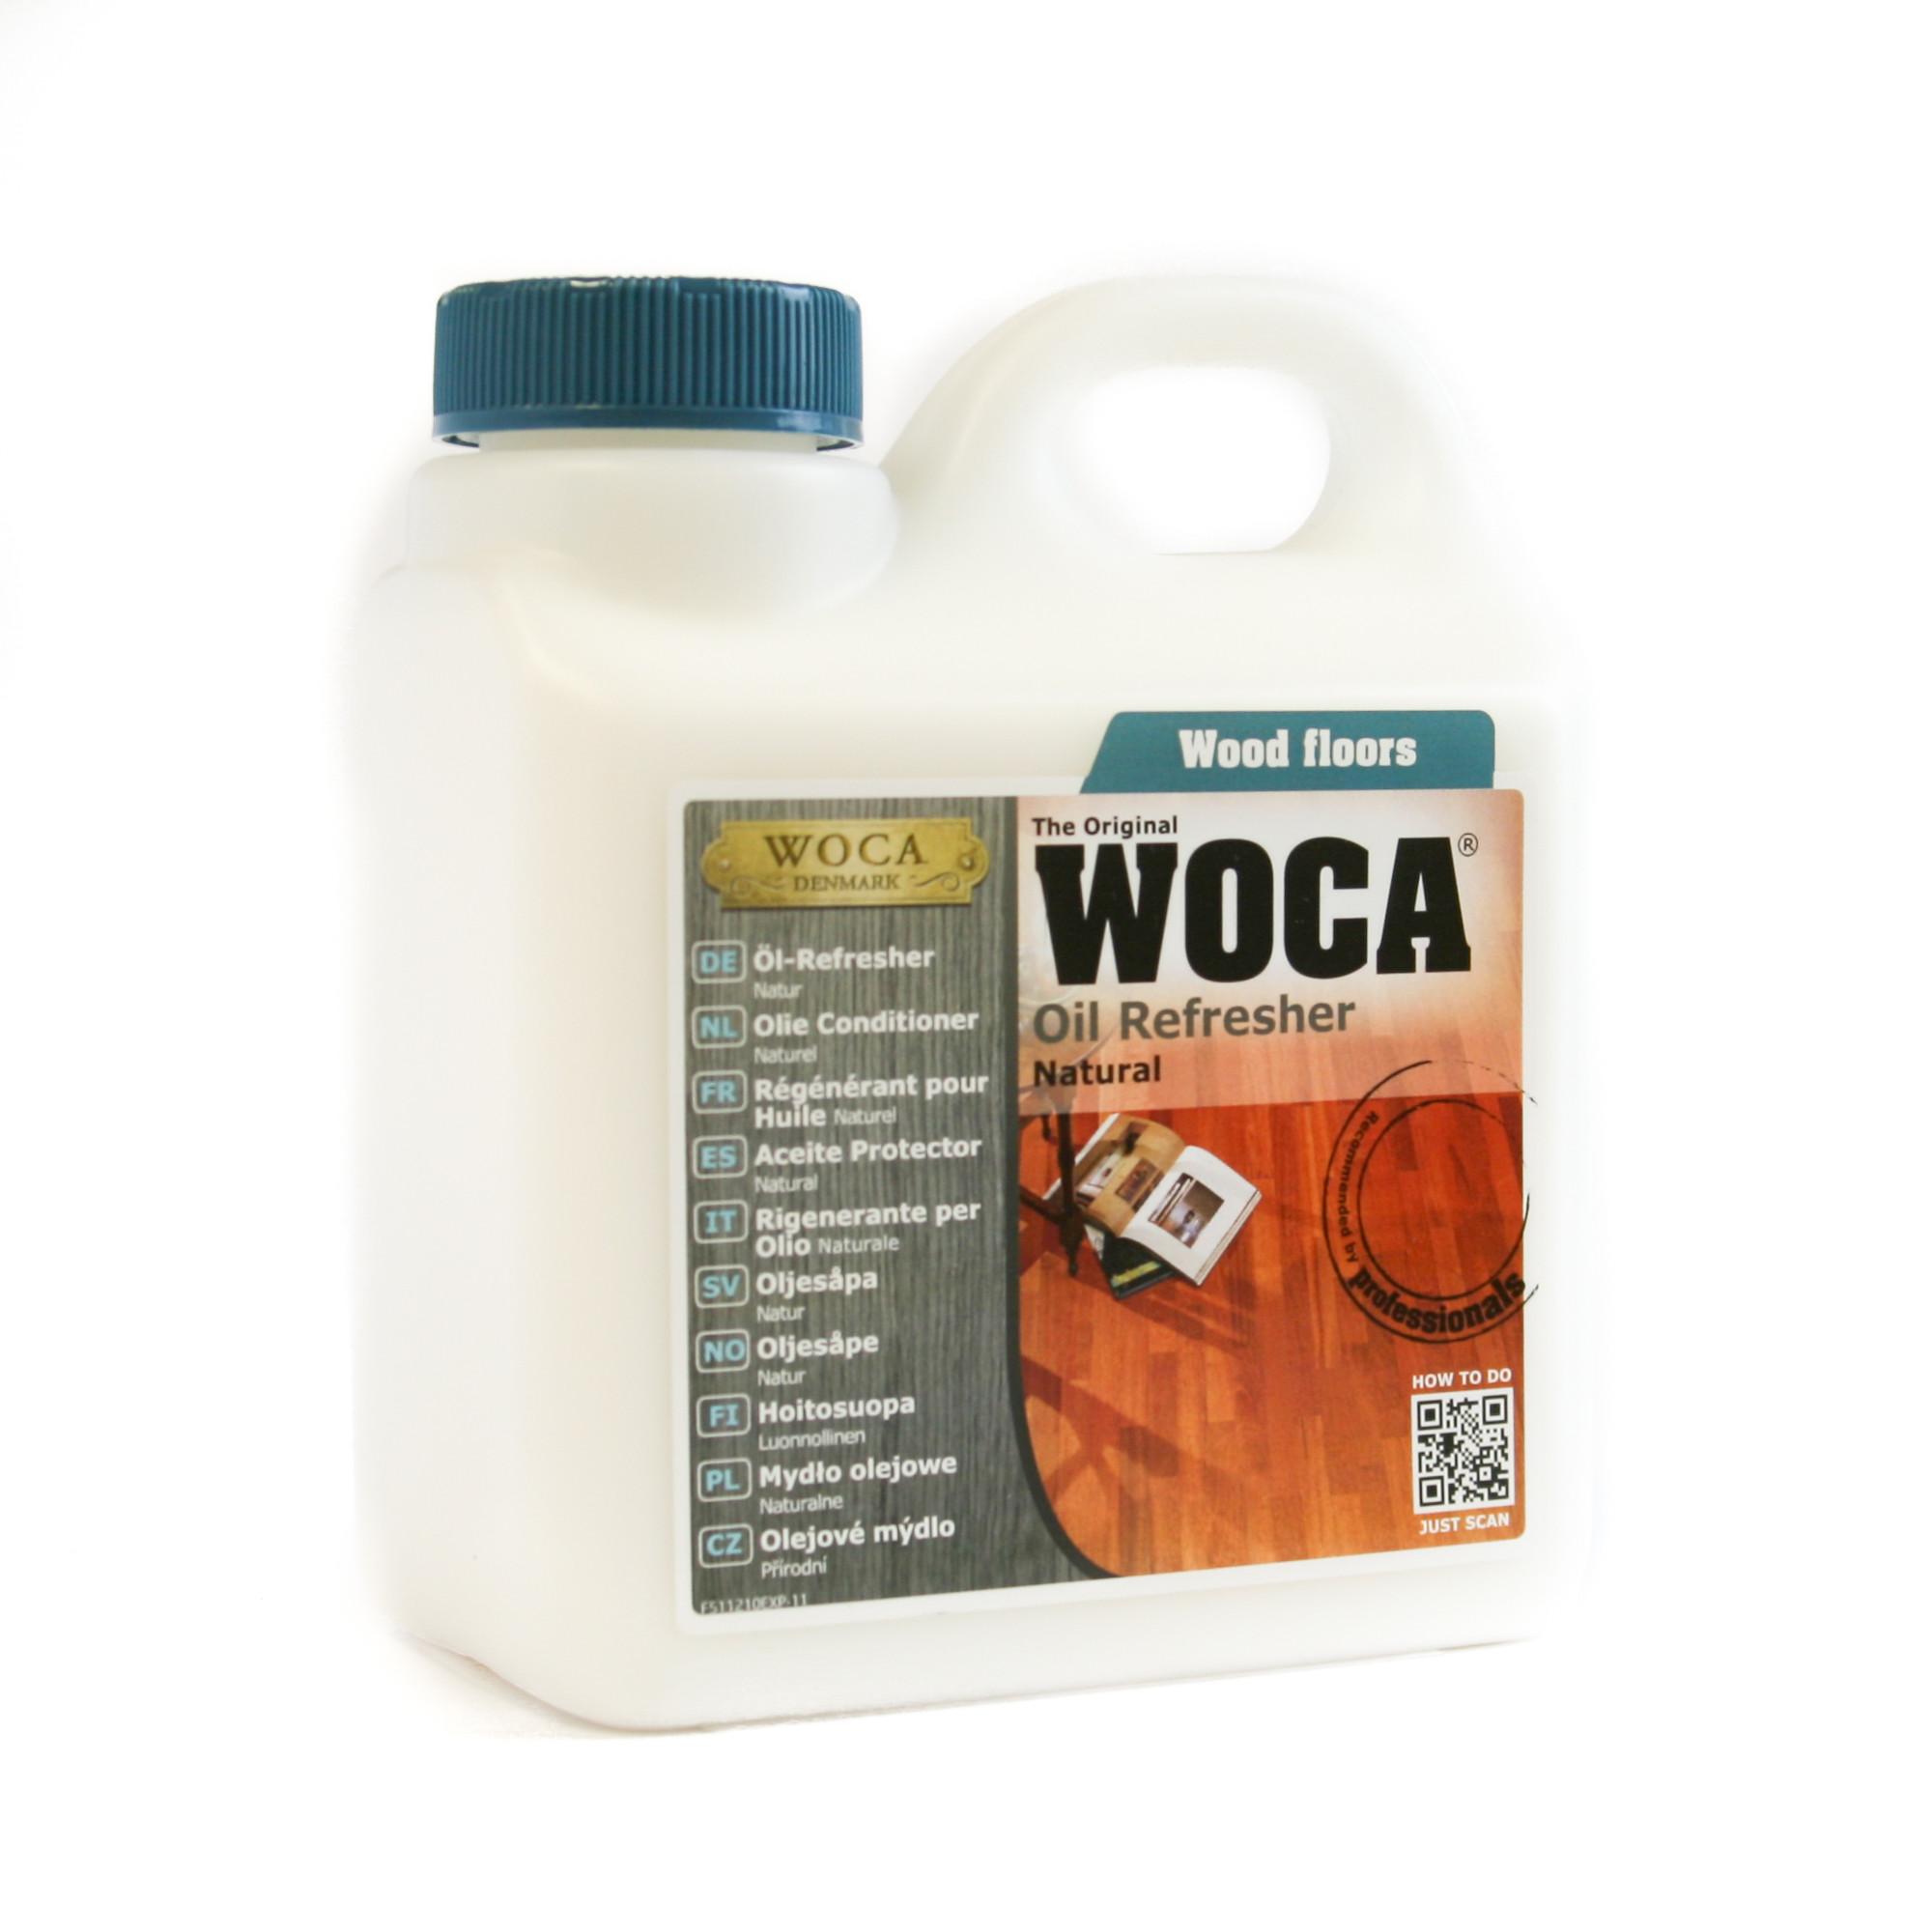 woca oil refresher.jpg